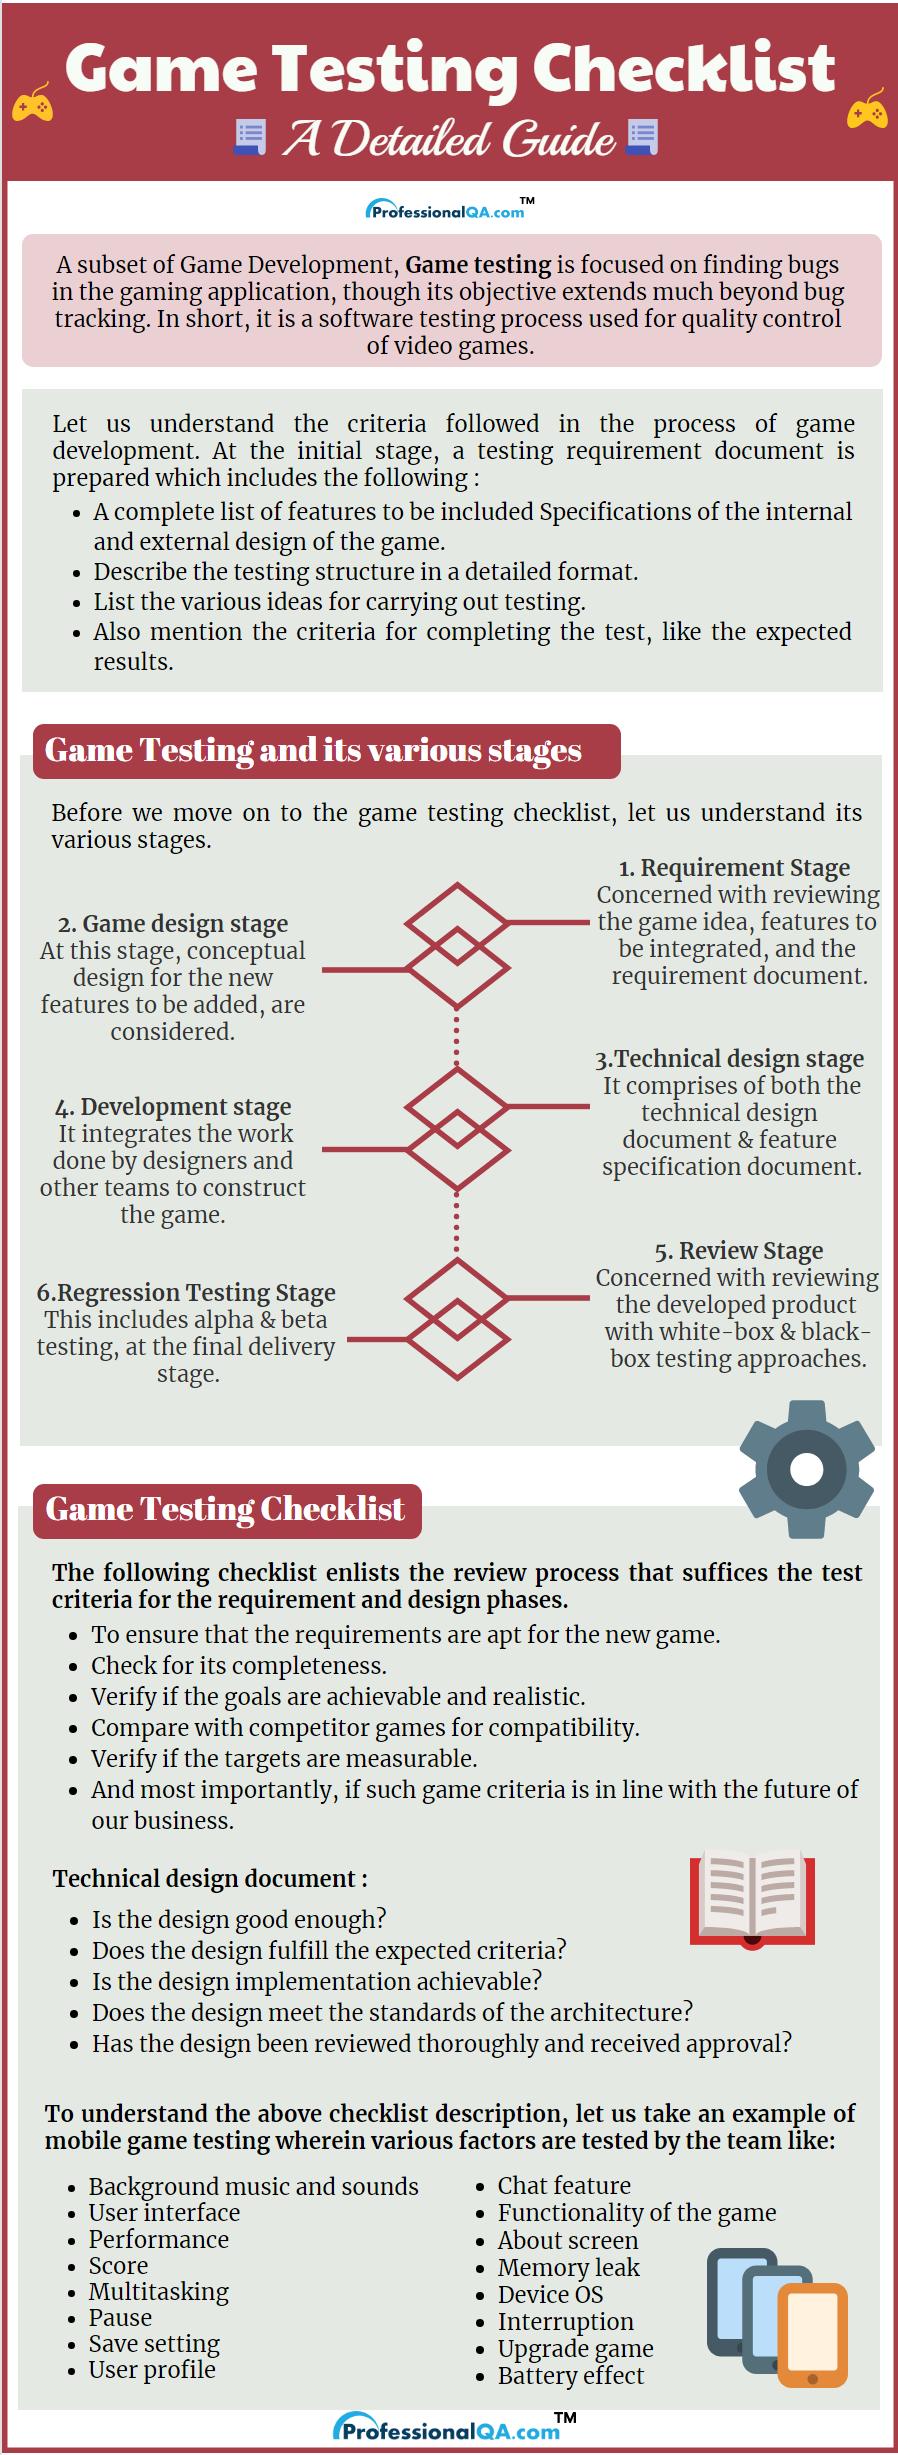 Game Testing Checklist Professionalqa Com,Elements And Principles Of Design Matrix Worksheet